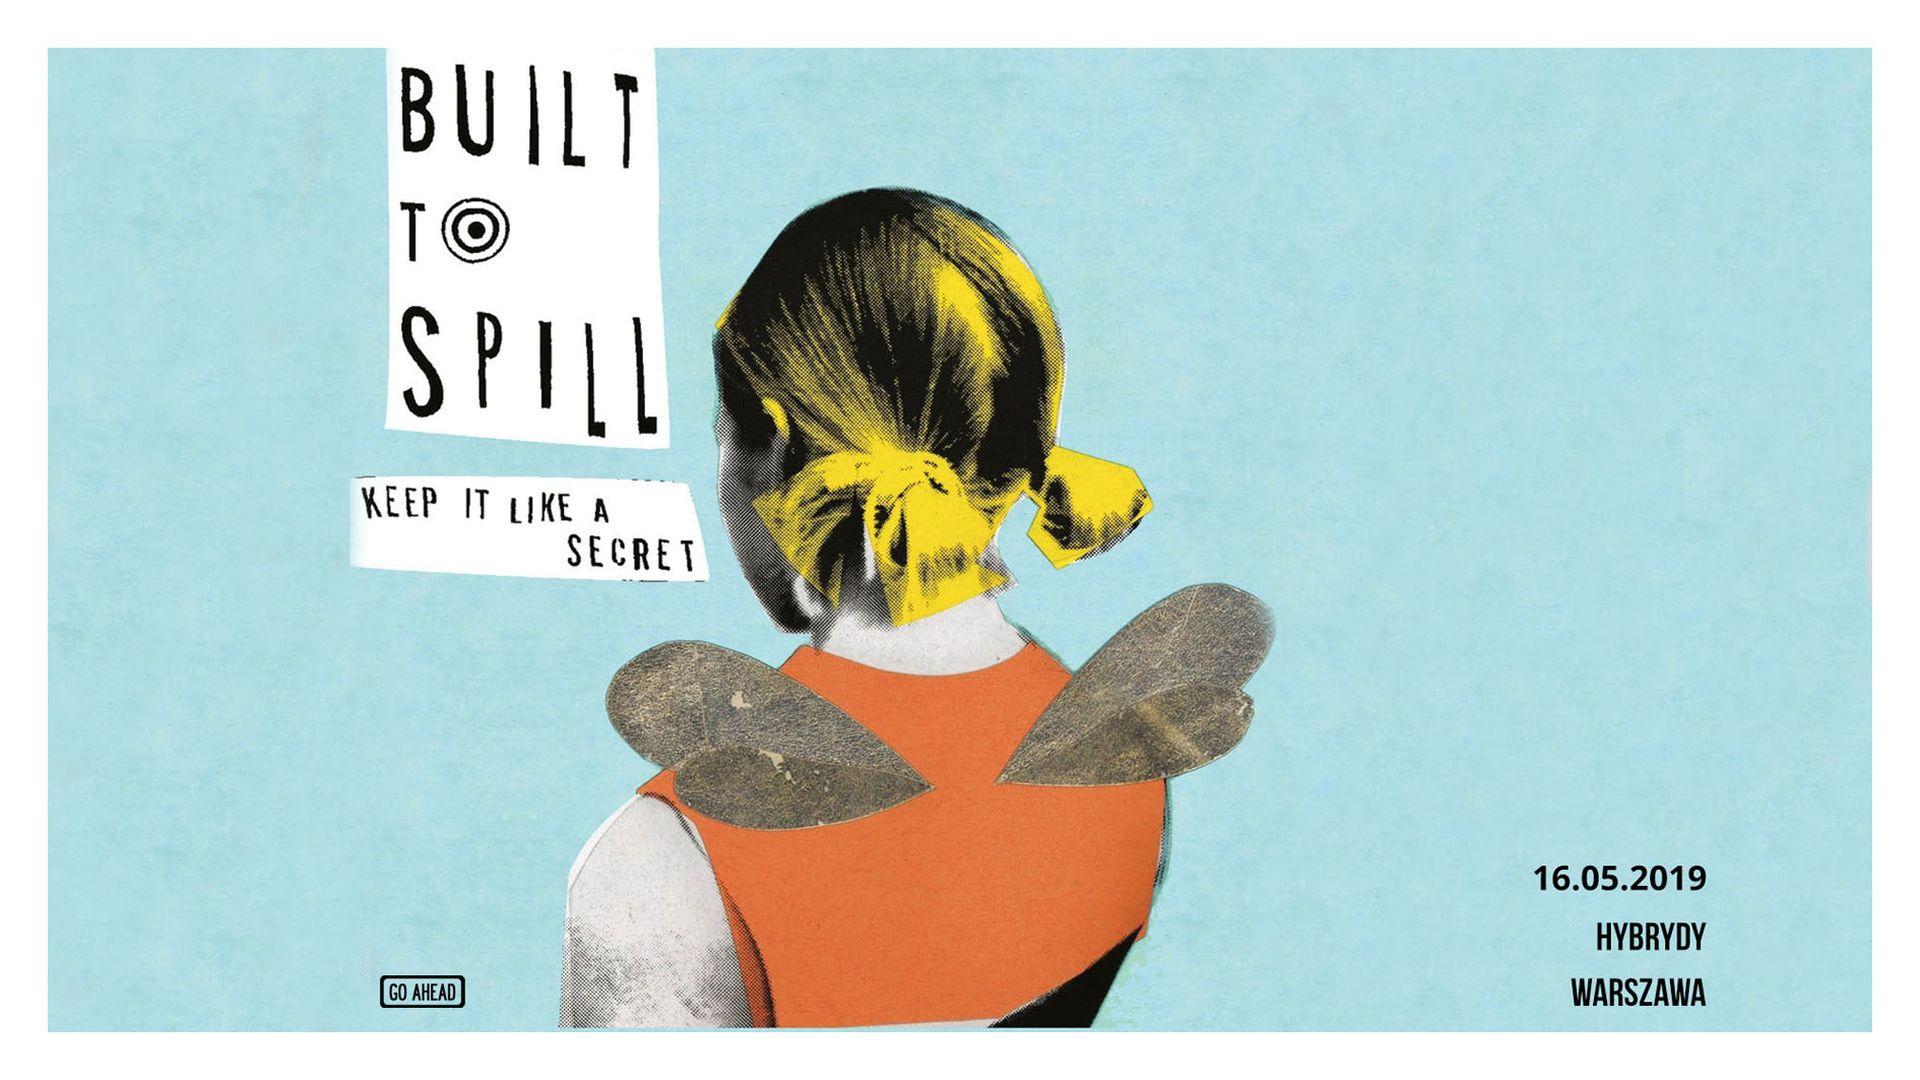 Bilety kolekcjonerskie - Built To Spill